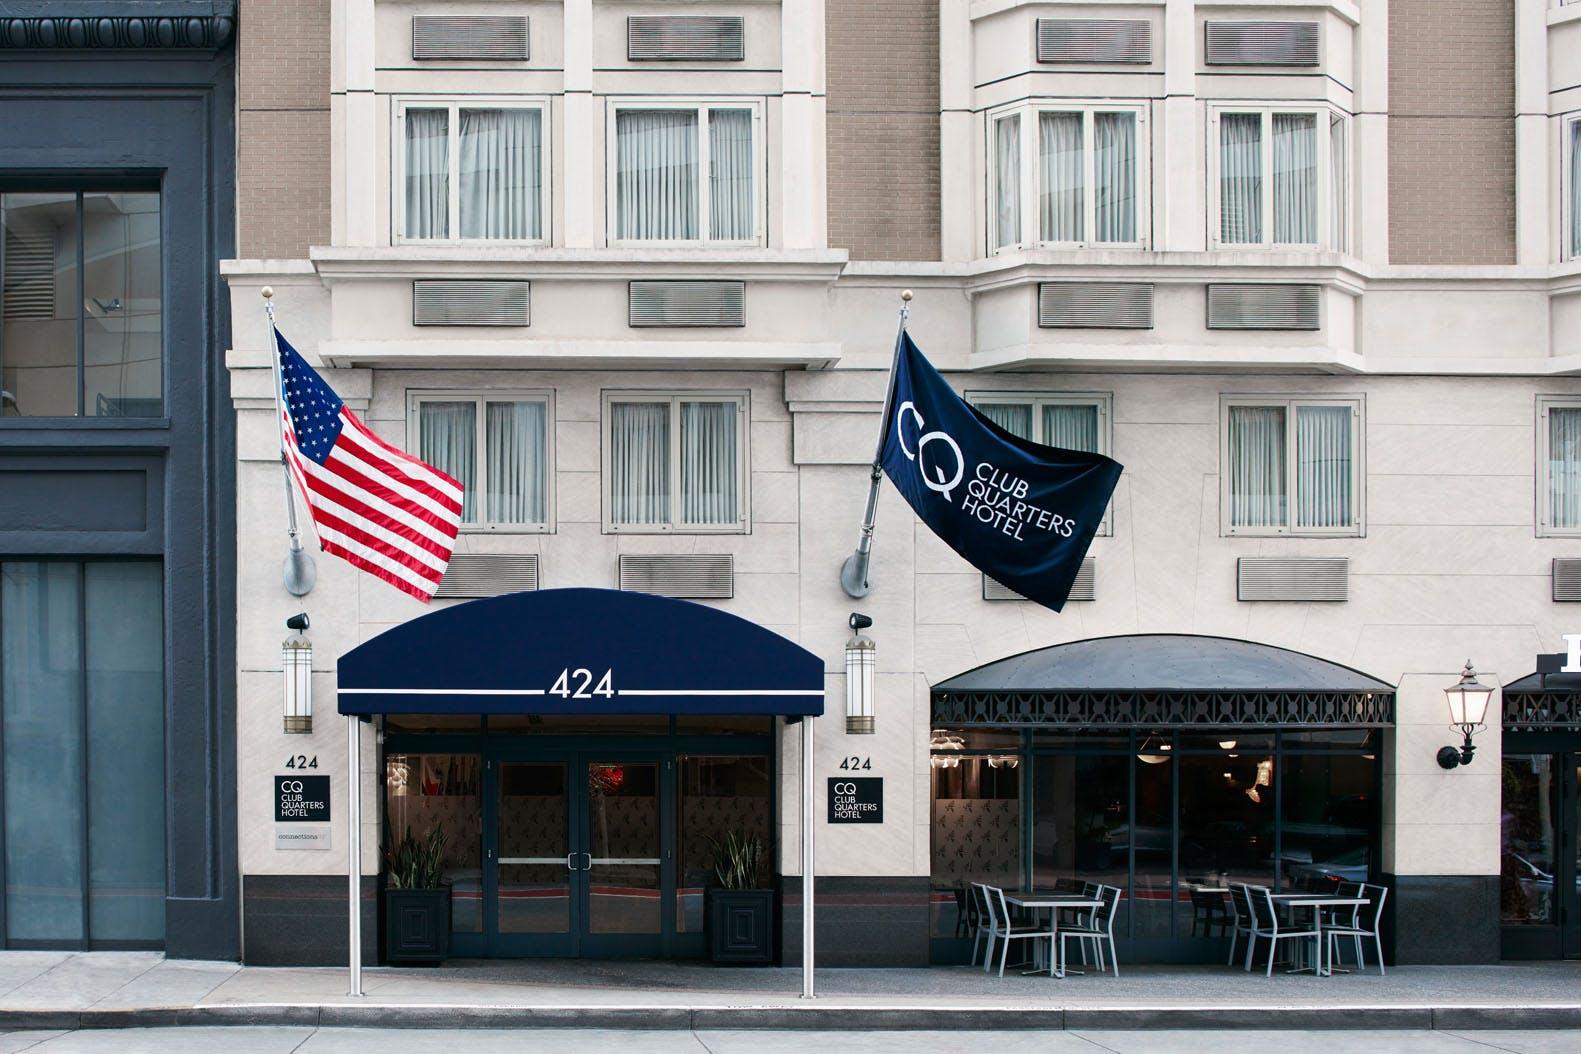 Exterior of Club Quarters Hotel in San Francisco